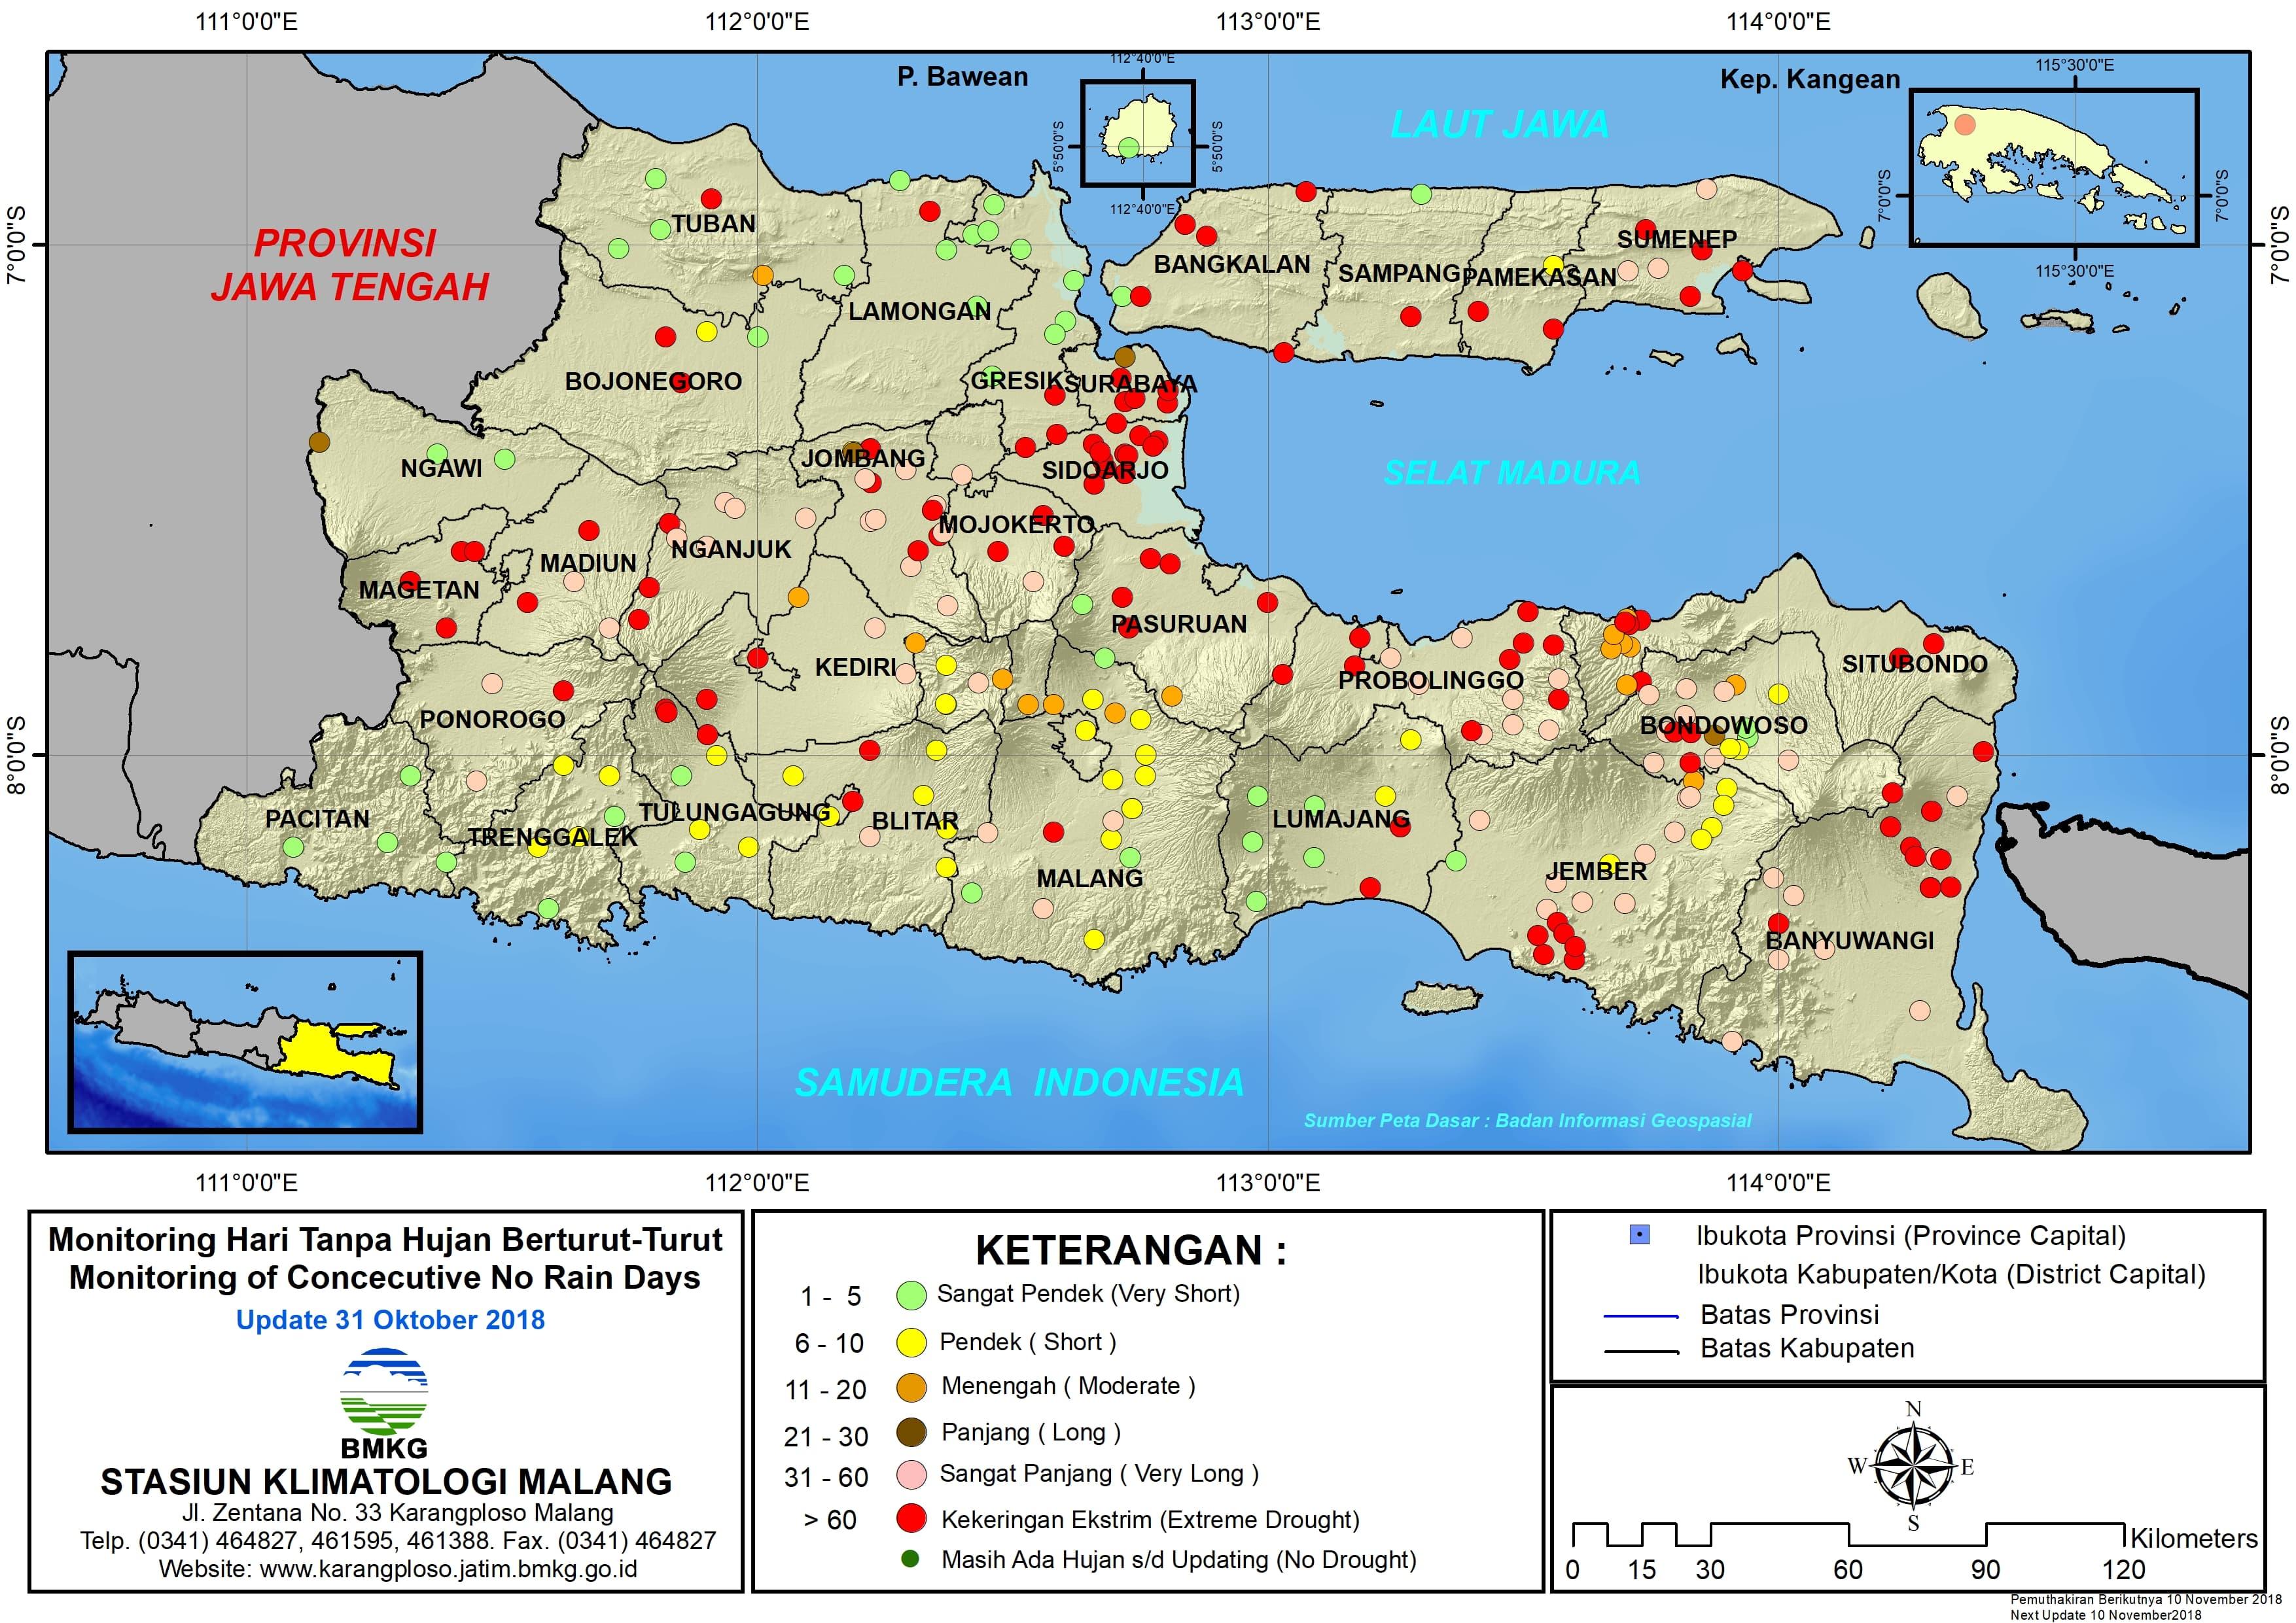 Monitoring Hari Tanpa Hujan Berturut-Turut Dasarian Update 31 Oktober 2018 di Provinsi Jawa Timur